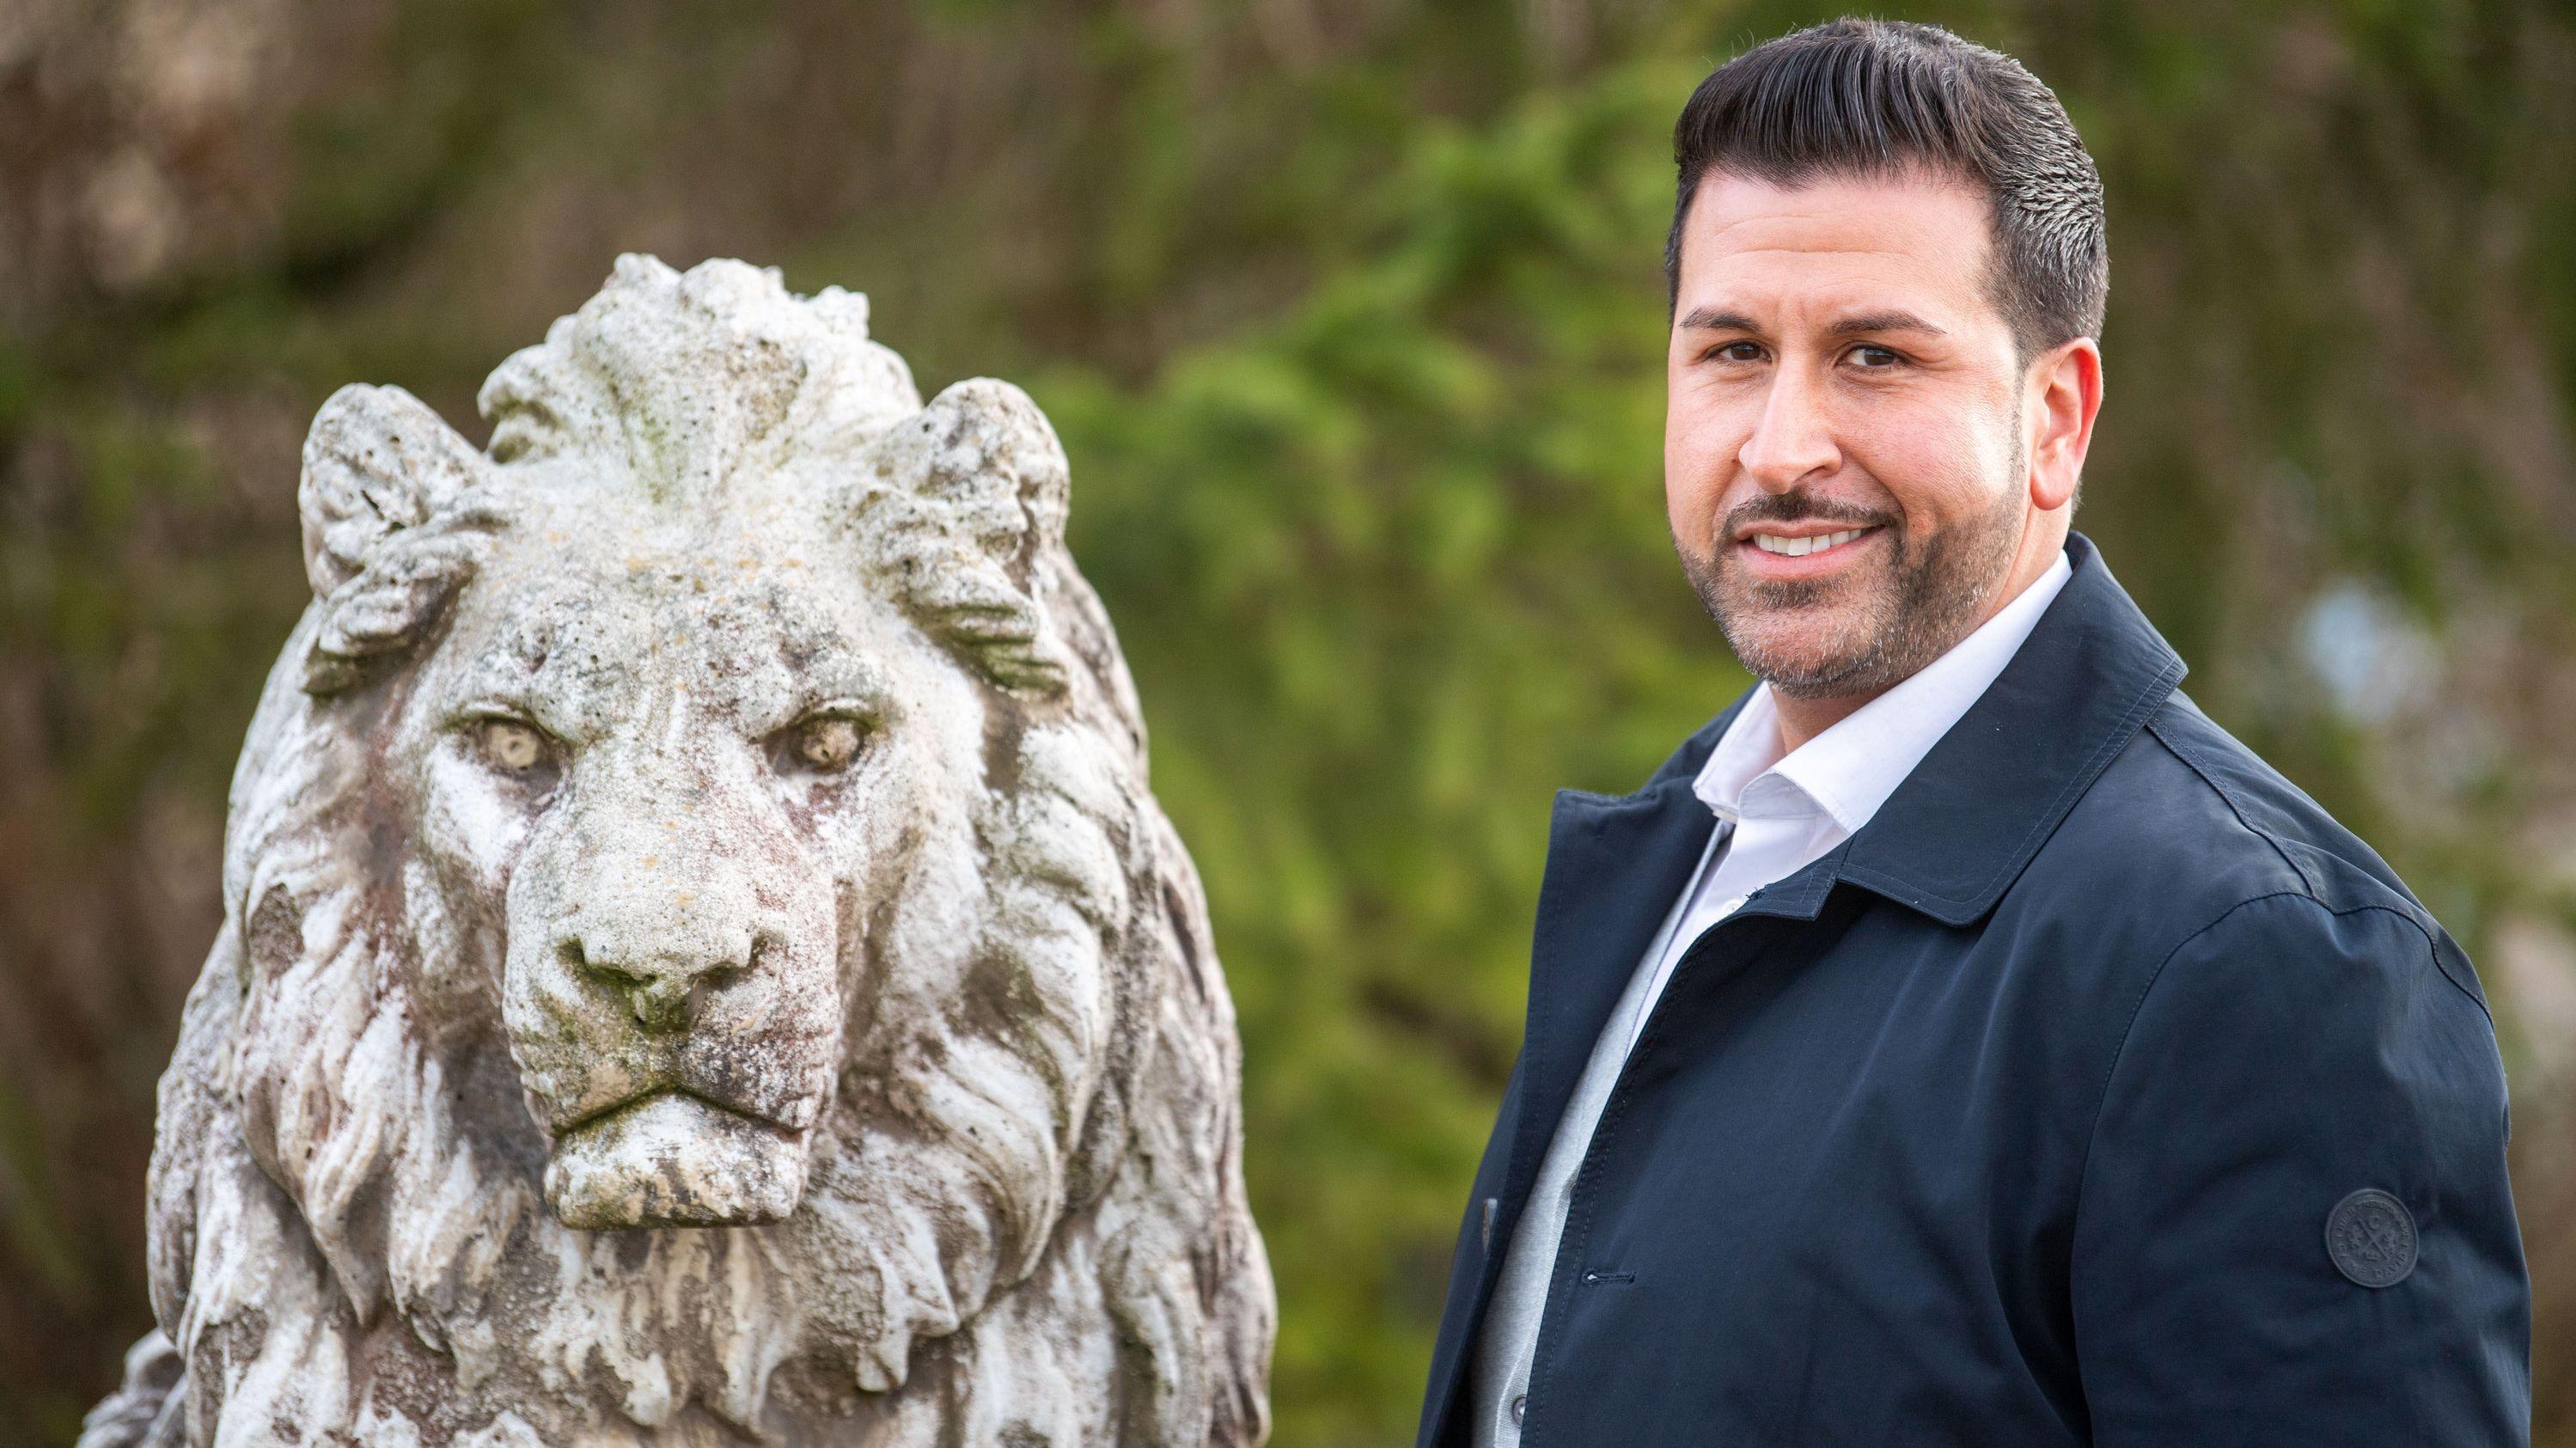 Ozan Iyibas, Bürgermeisterkandidat der CSU in Neufahrn